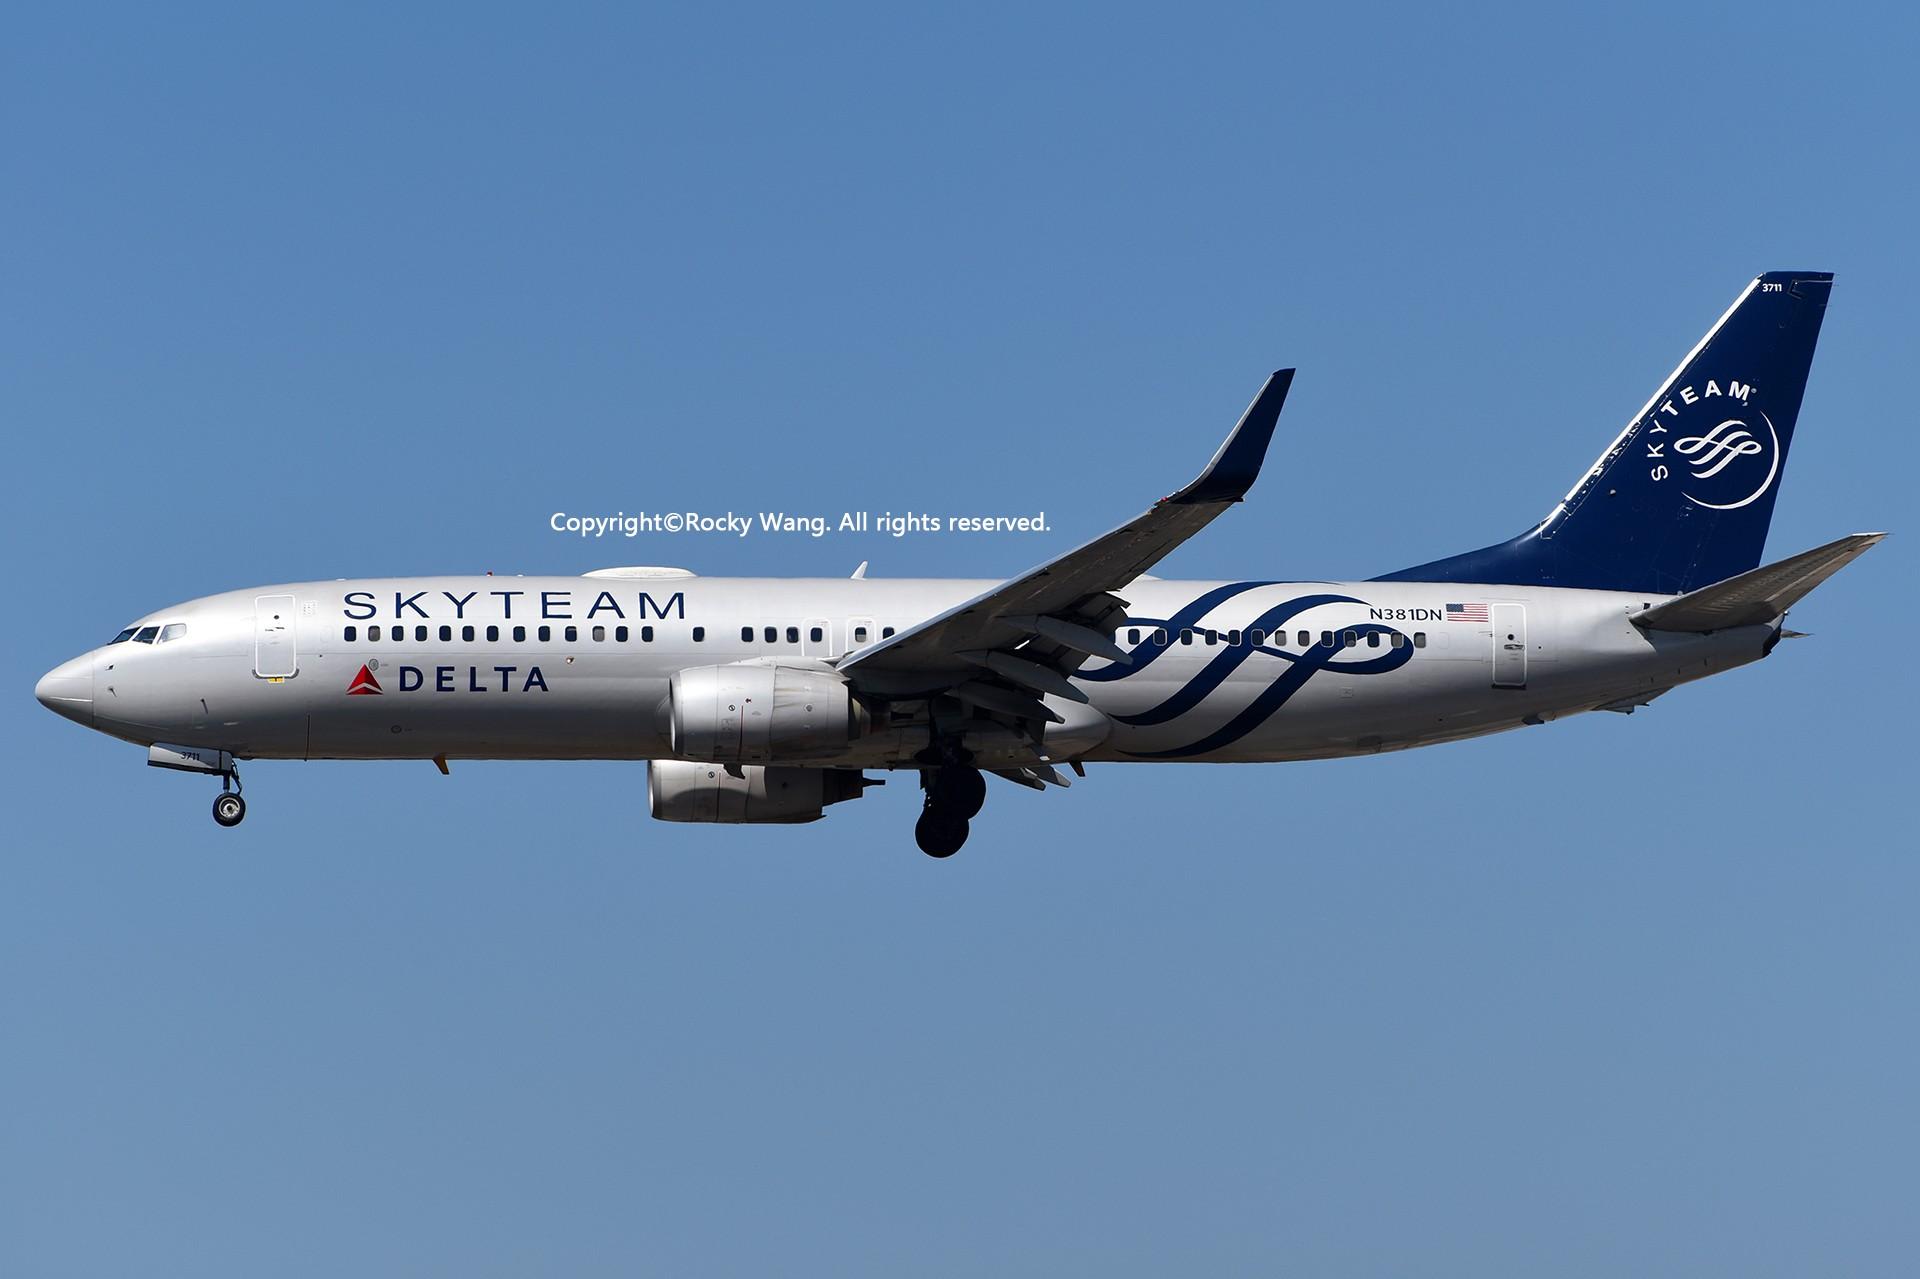 Re:[原创]彩绘圣地-附加彩蛋 BOEING 737-832 N381DN Los Angeles Int'l Airport